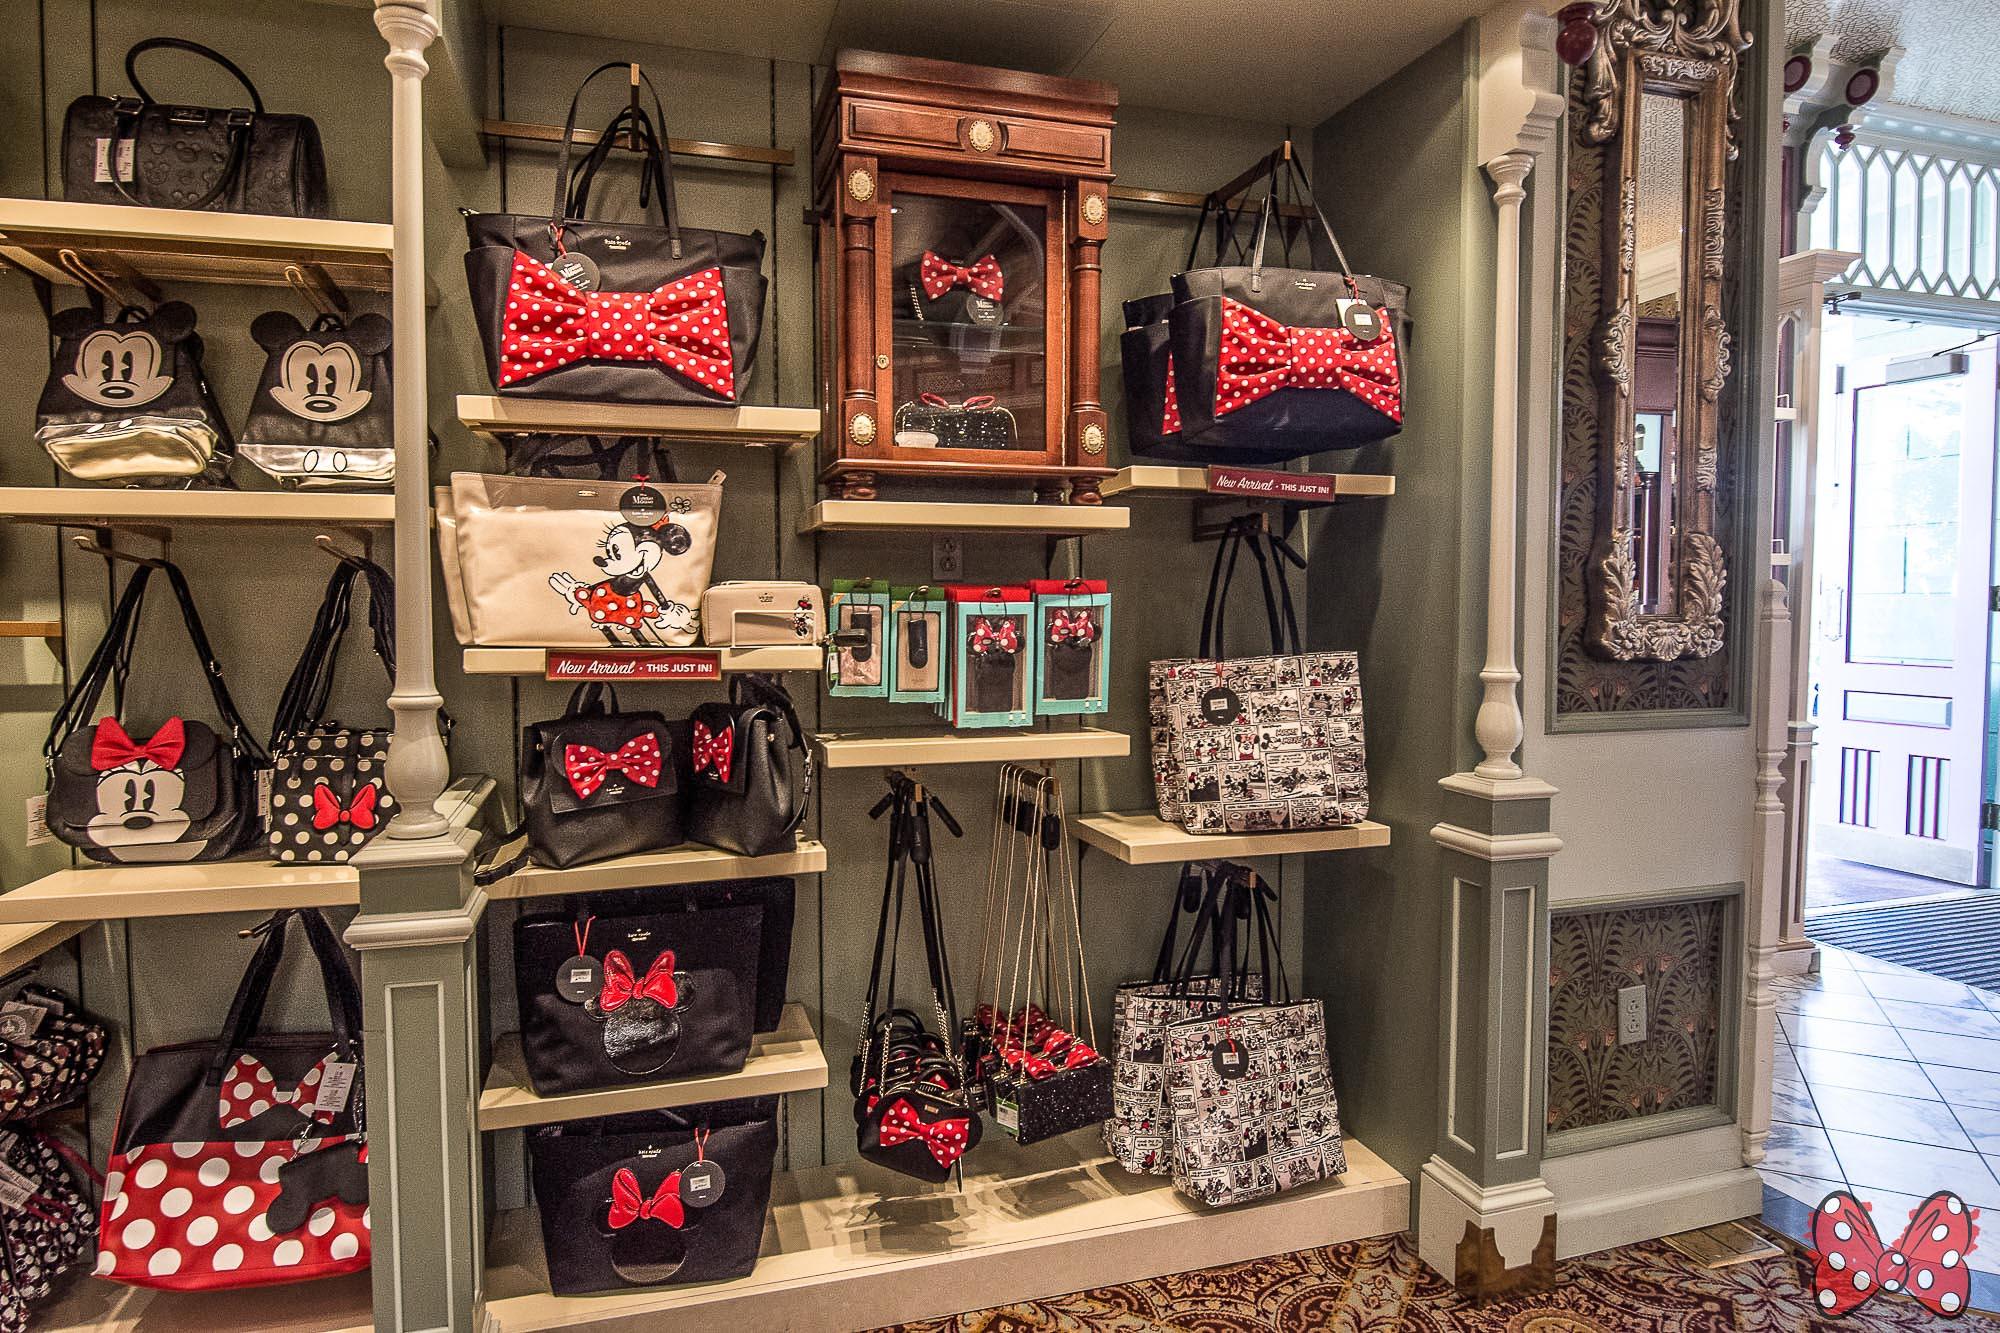 New Gorgeous Kate Spade Handbags At Magic Kingdom Blog